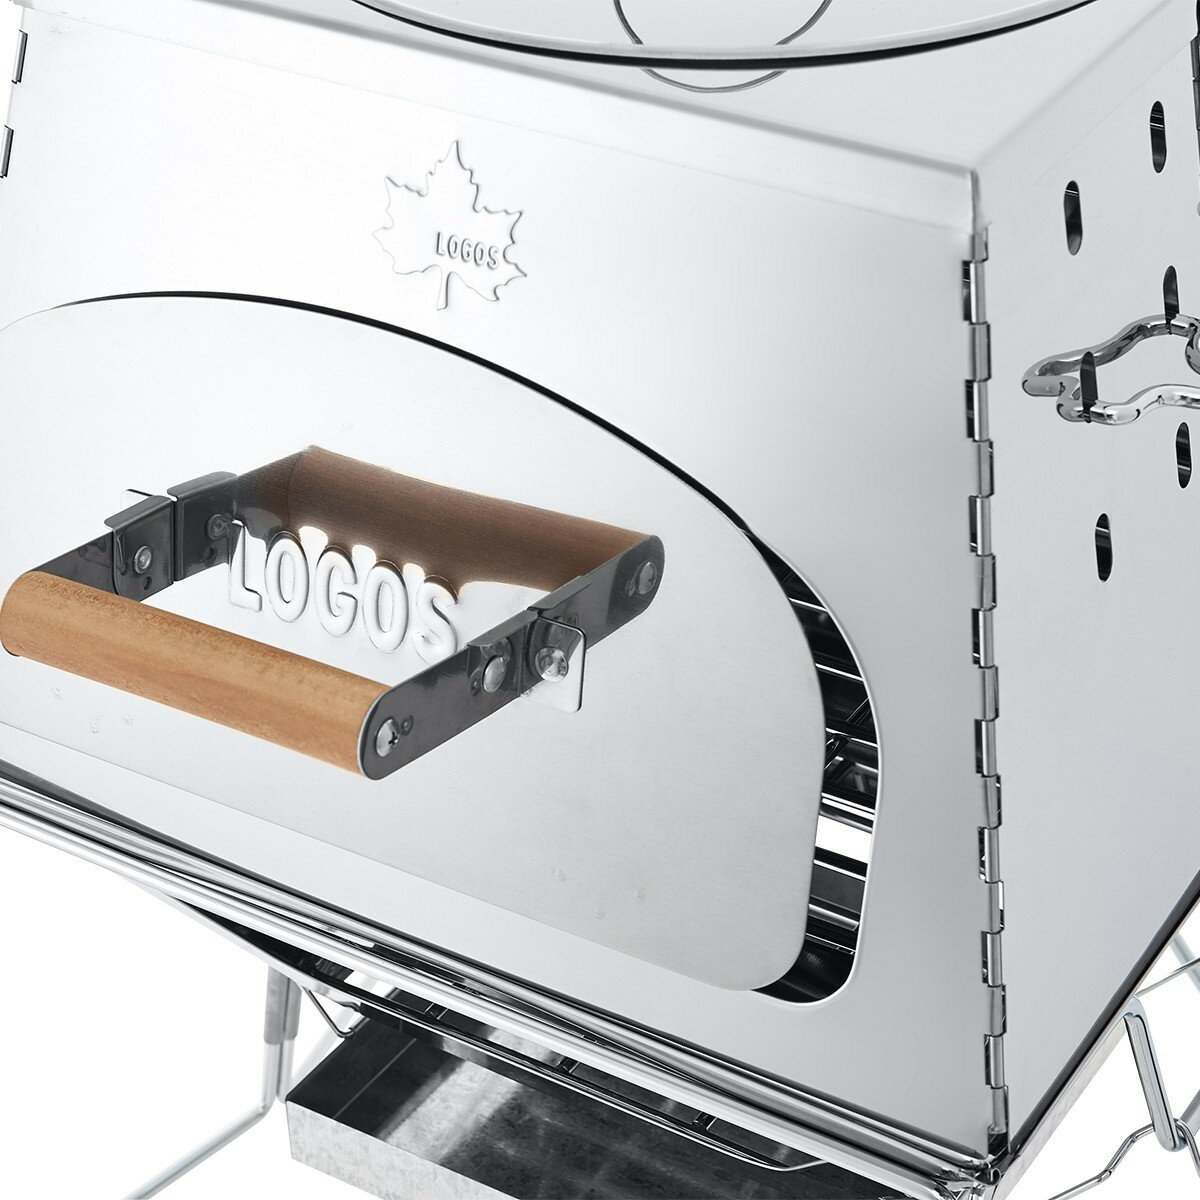 LOGOS/ロゴス KAMADOオプション・専用遮温カバー 熱を逃がさないKAMADO専用の遮温カバー